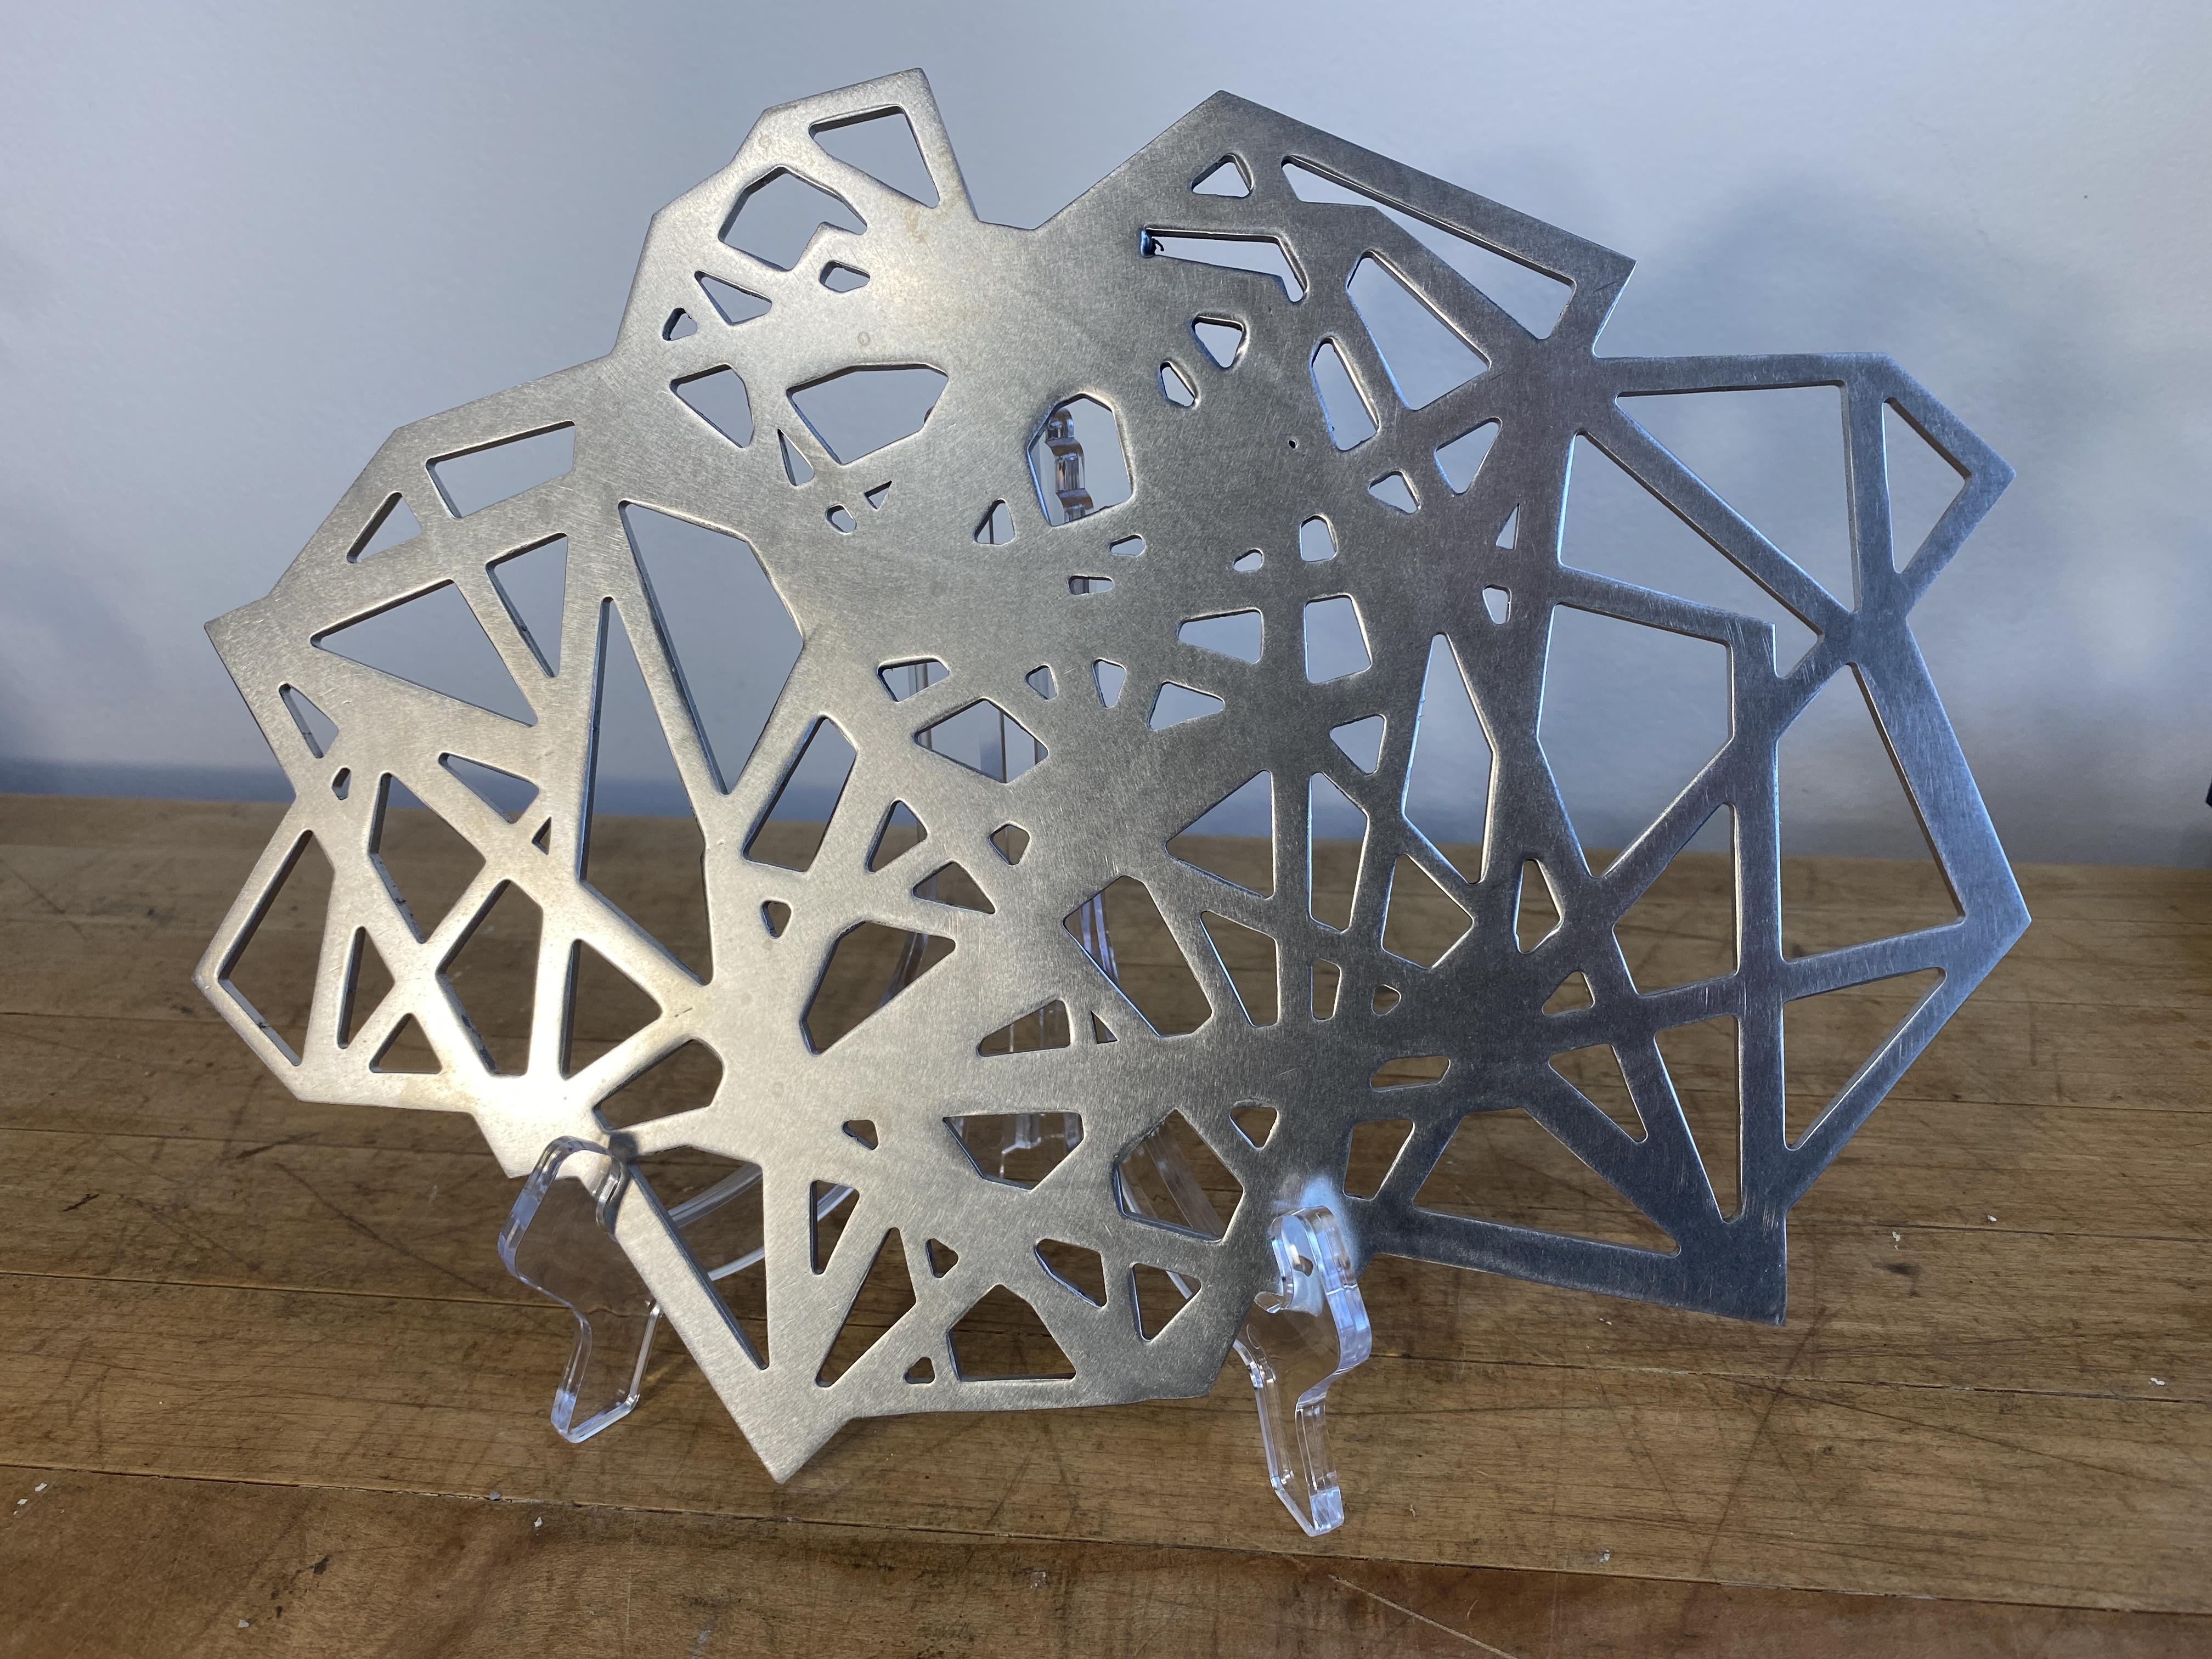 Plateau homeware design 2020  by Stephen Hendee